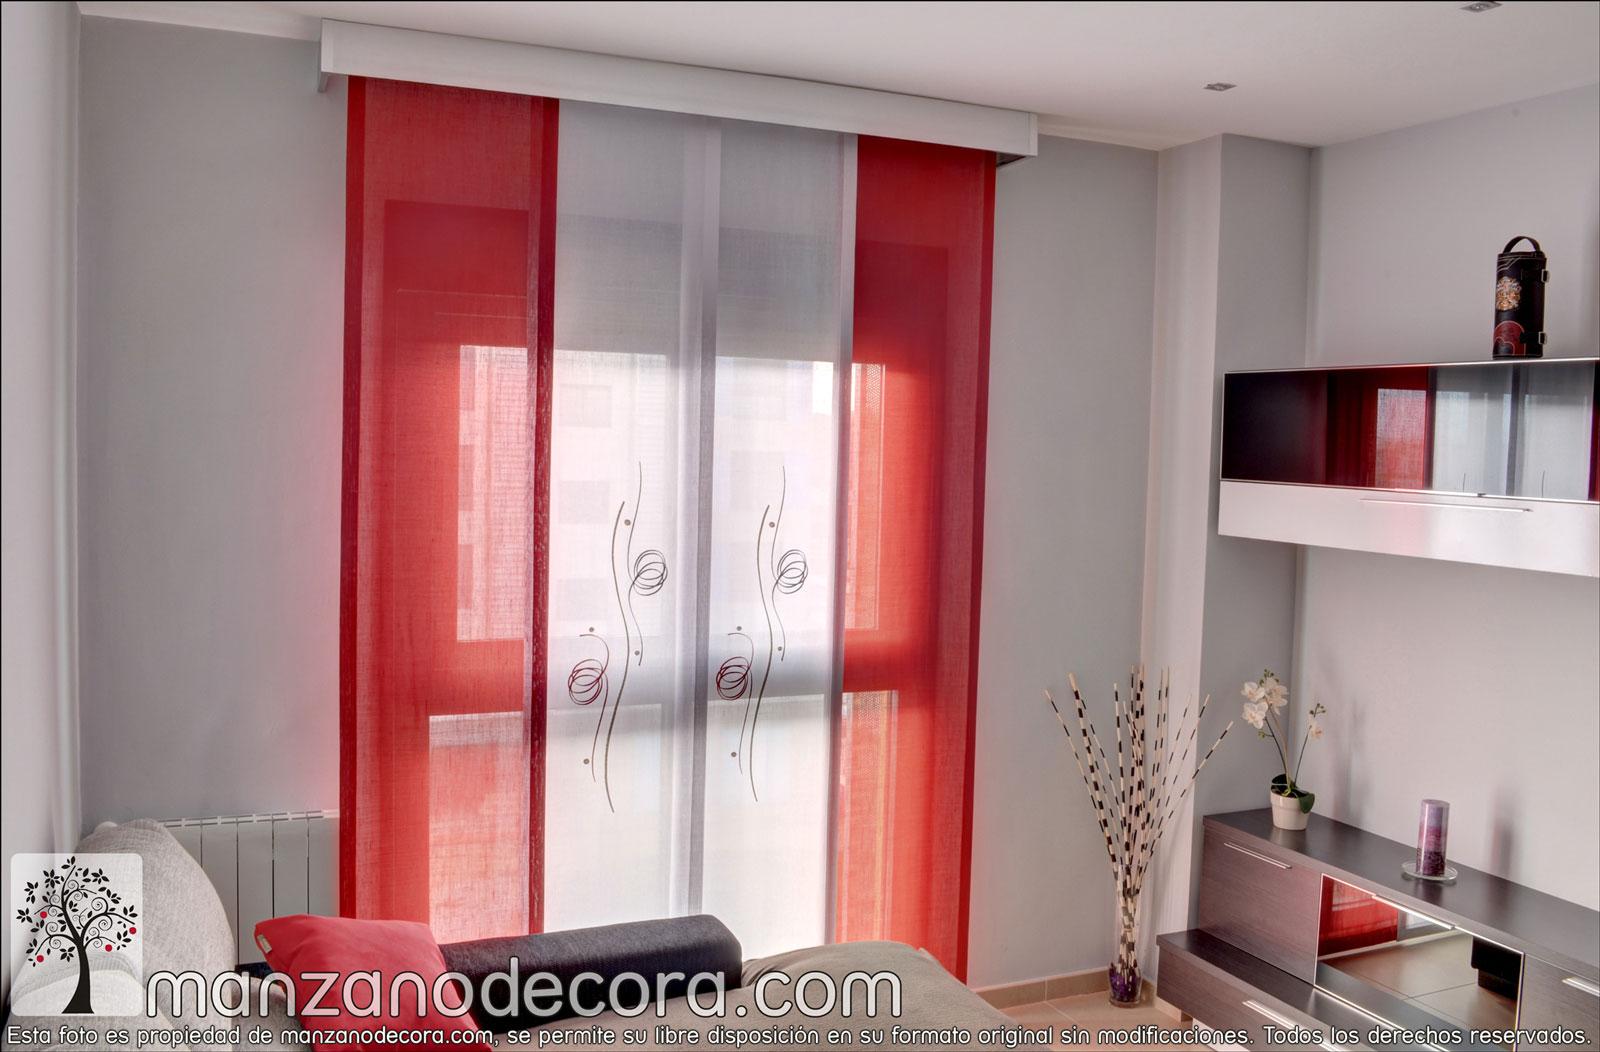 Paneles japoneses cortinas manzanodecora - Fotos paneles japoneses ...